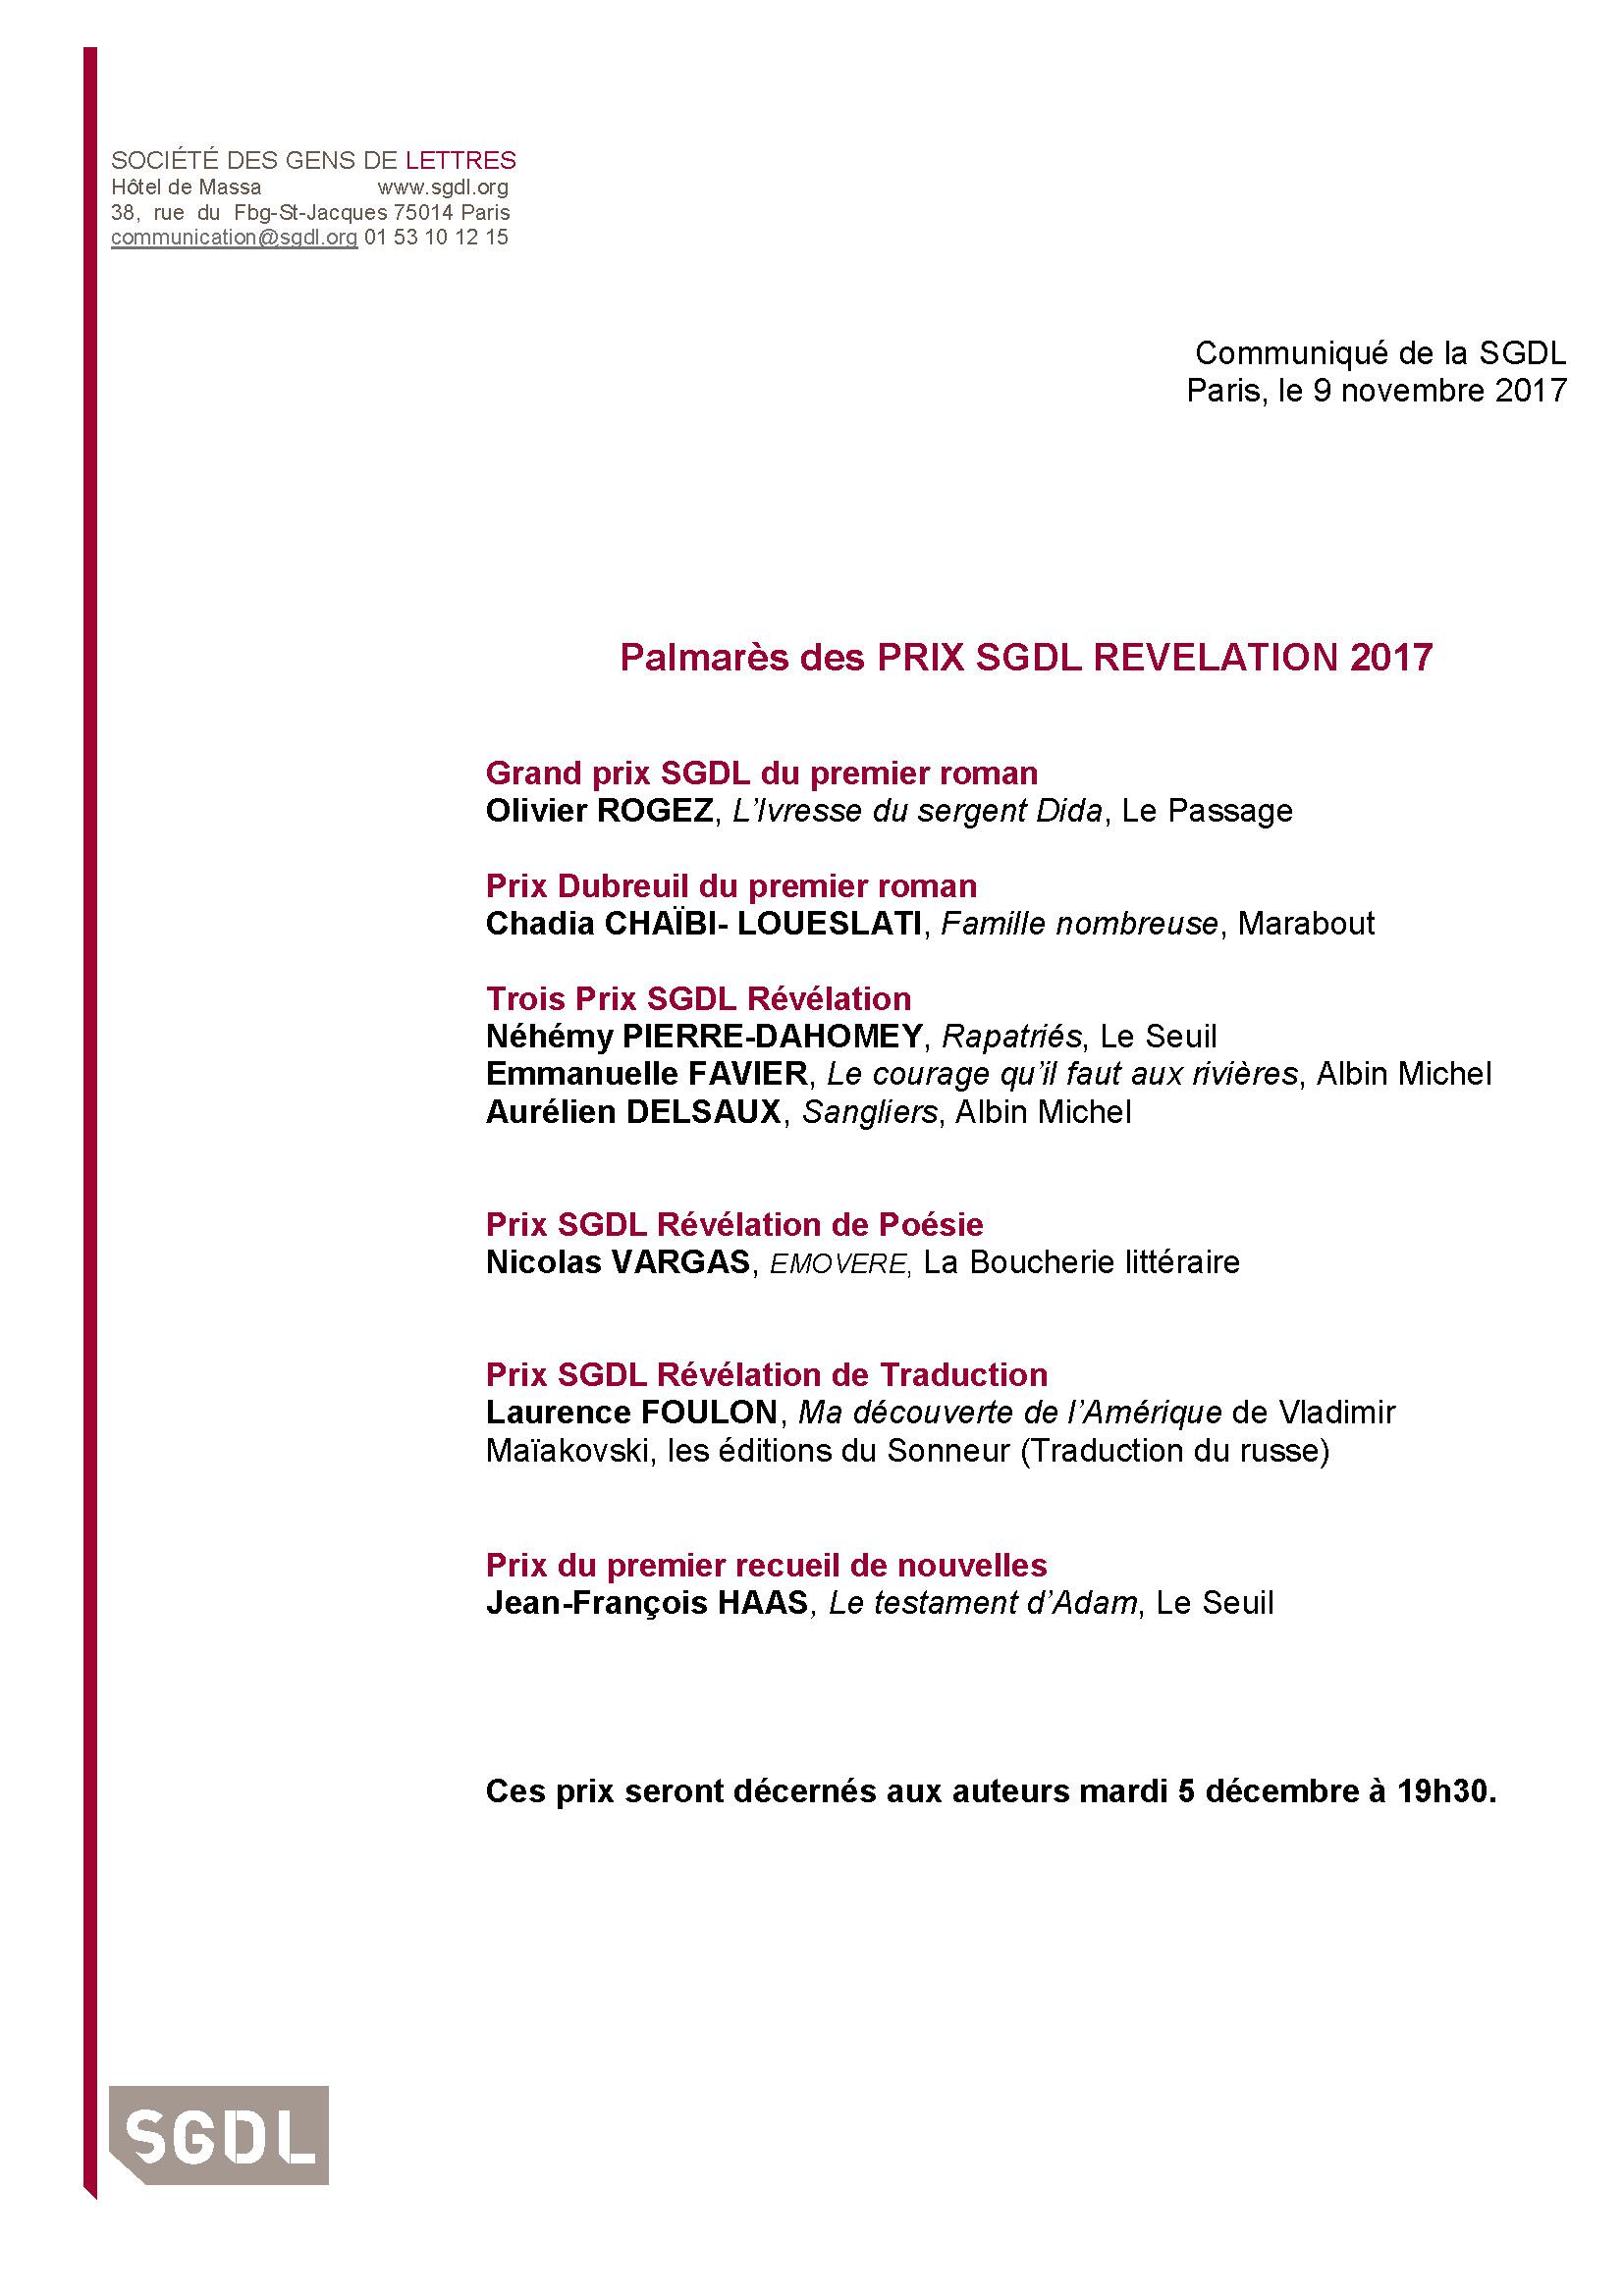 Communiqué_PRIX_SGDL_REVELATION_2017[7]